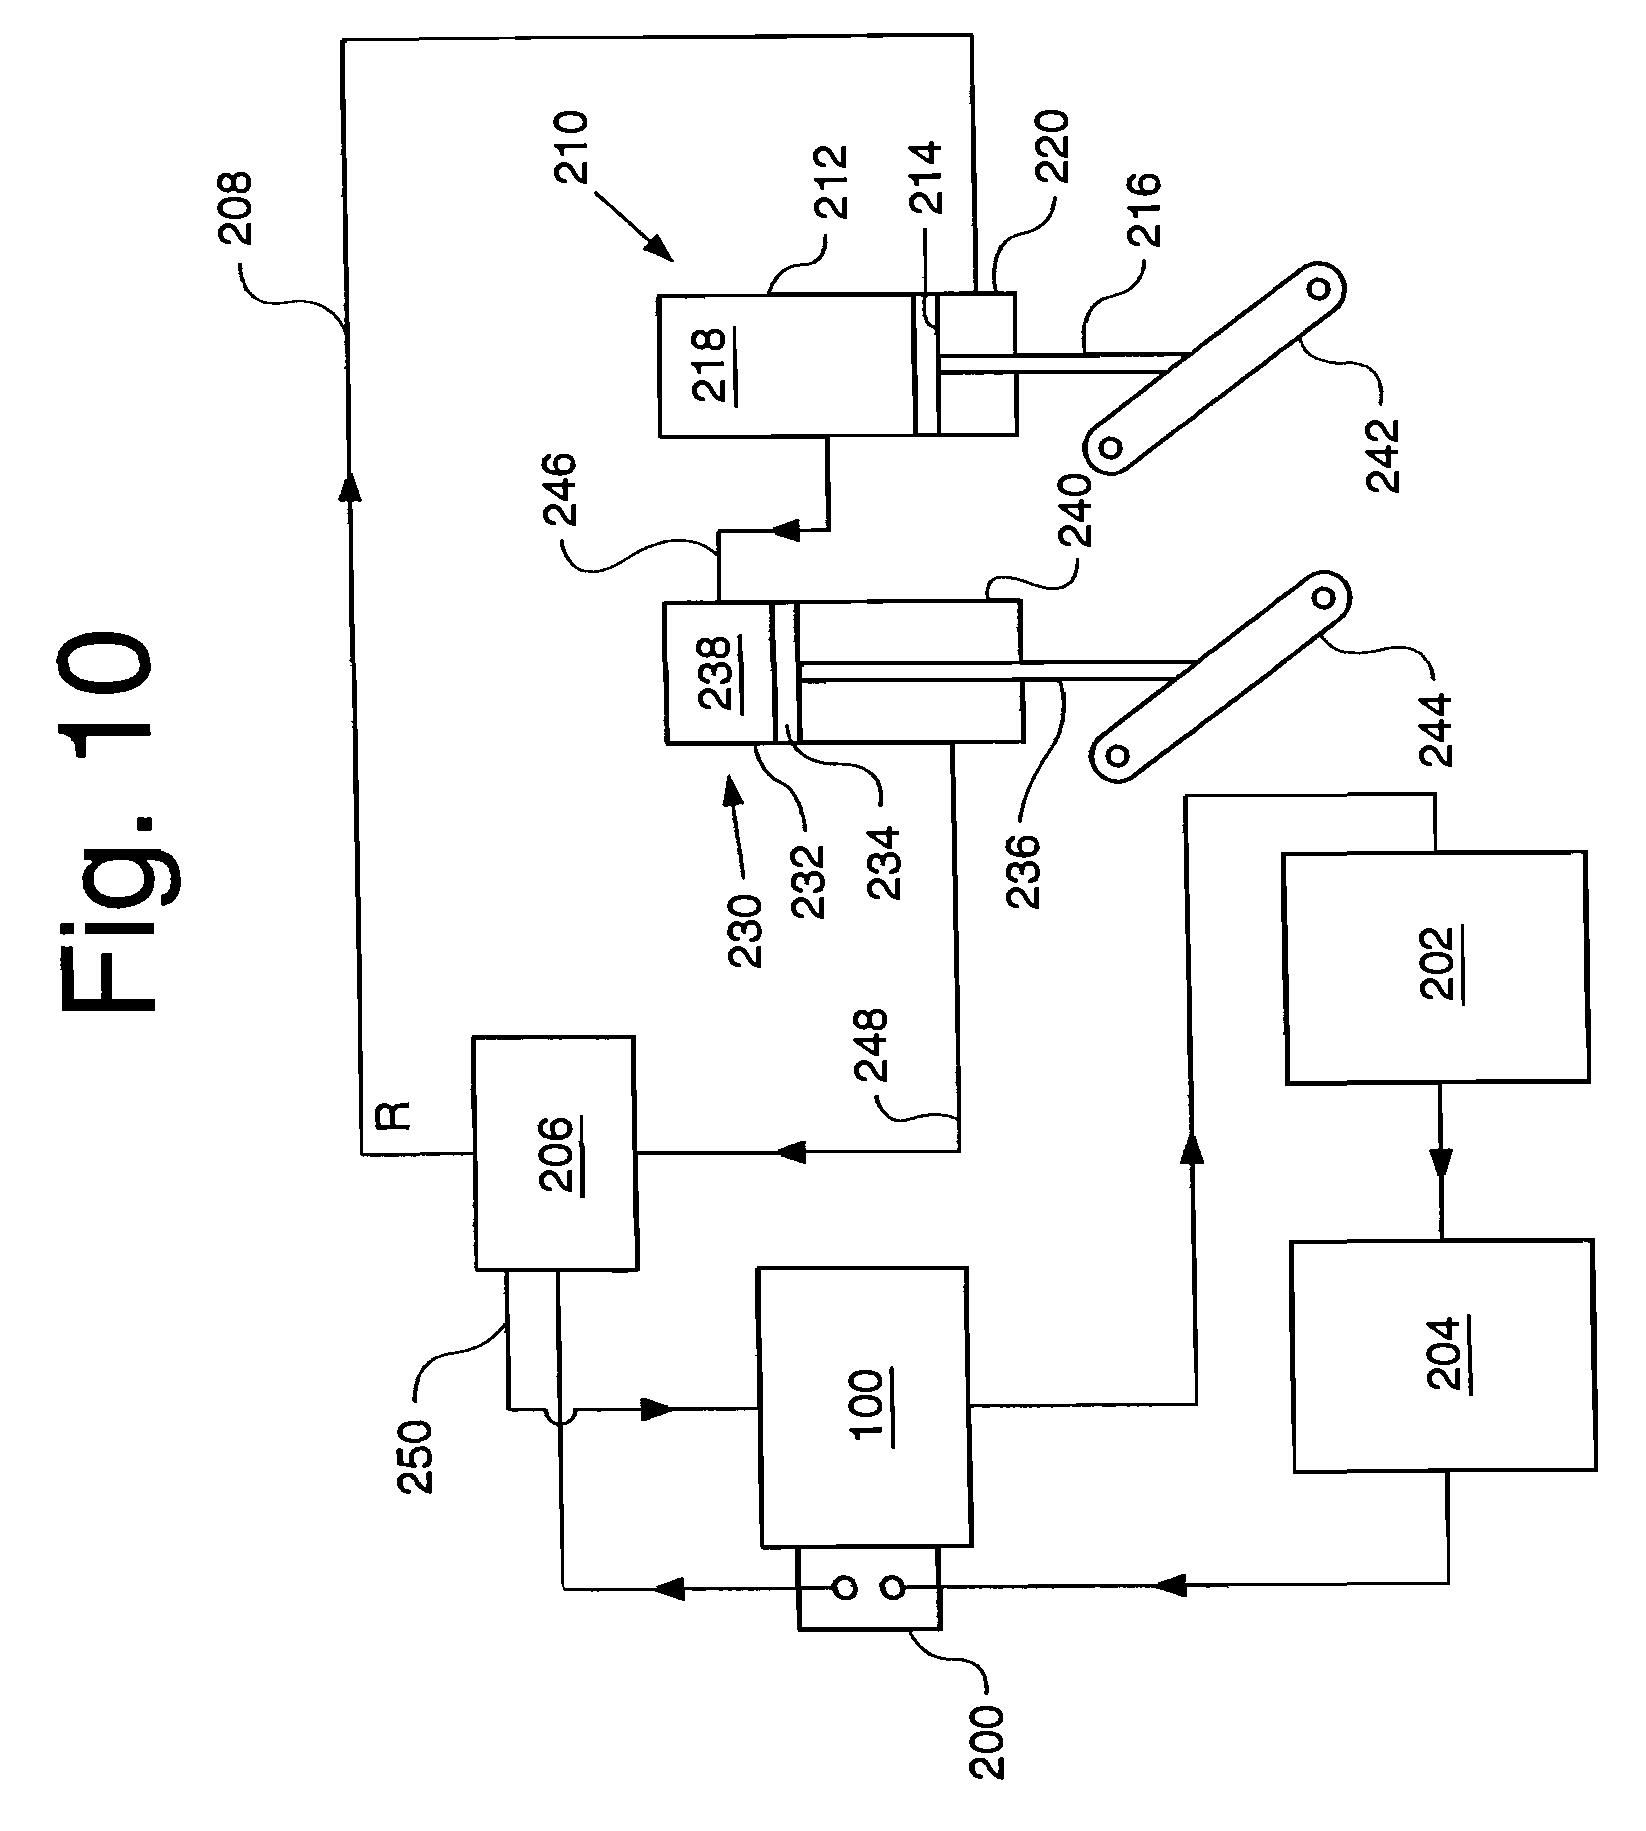 Roketa Atv Wiring Diagram 12. Diagram. Auto Wiring Diagram